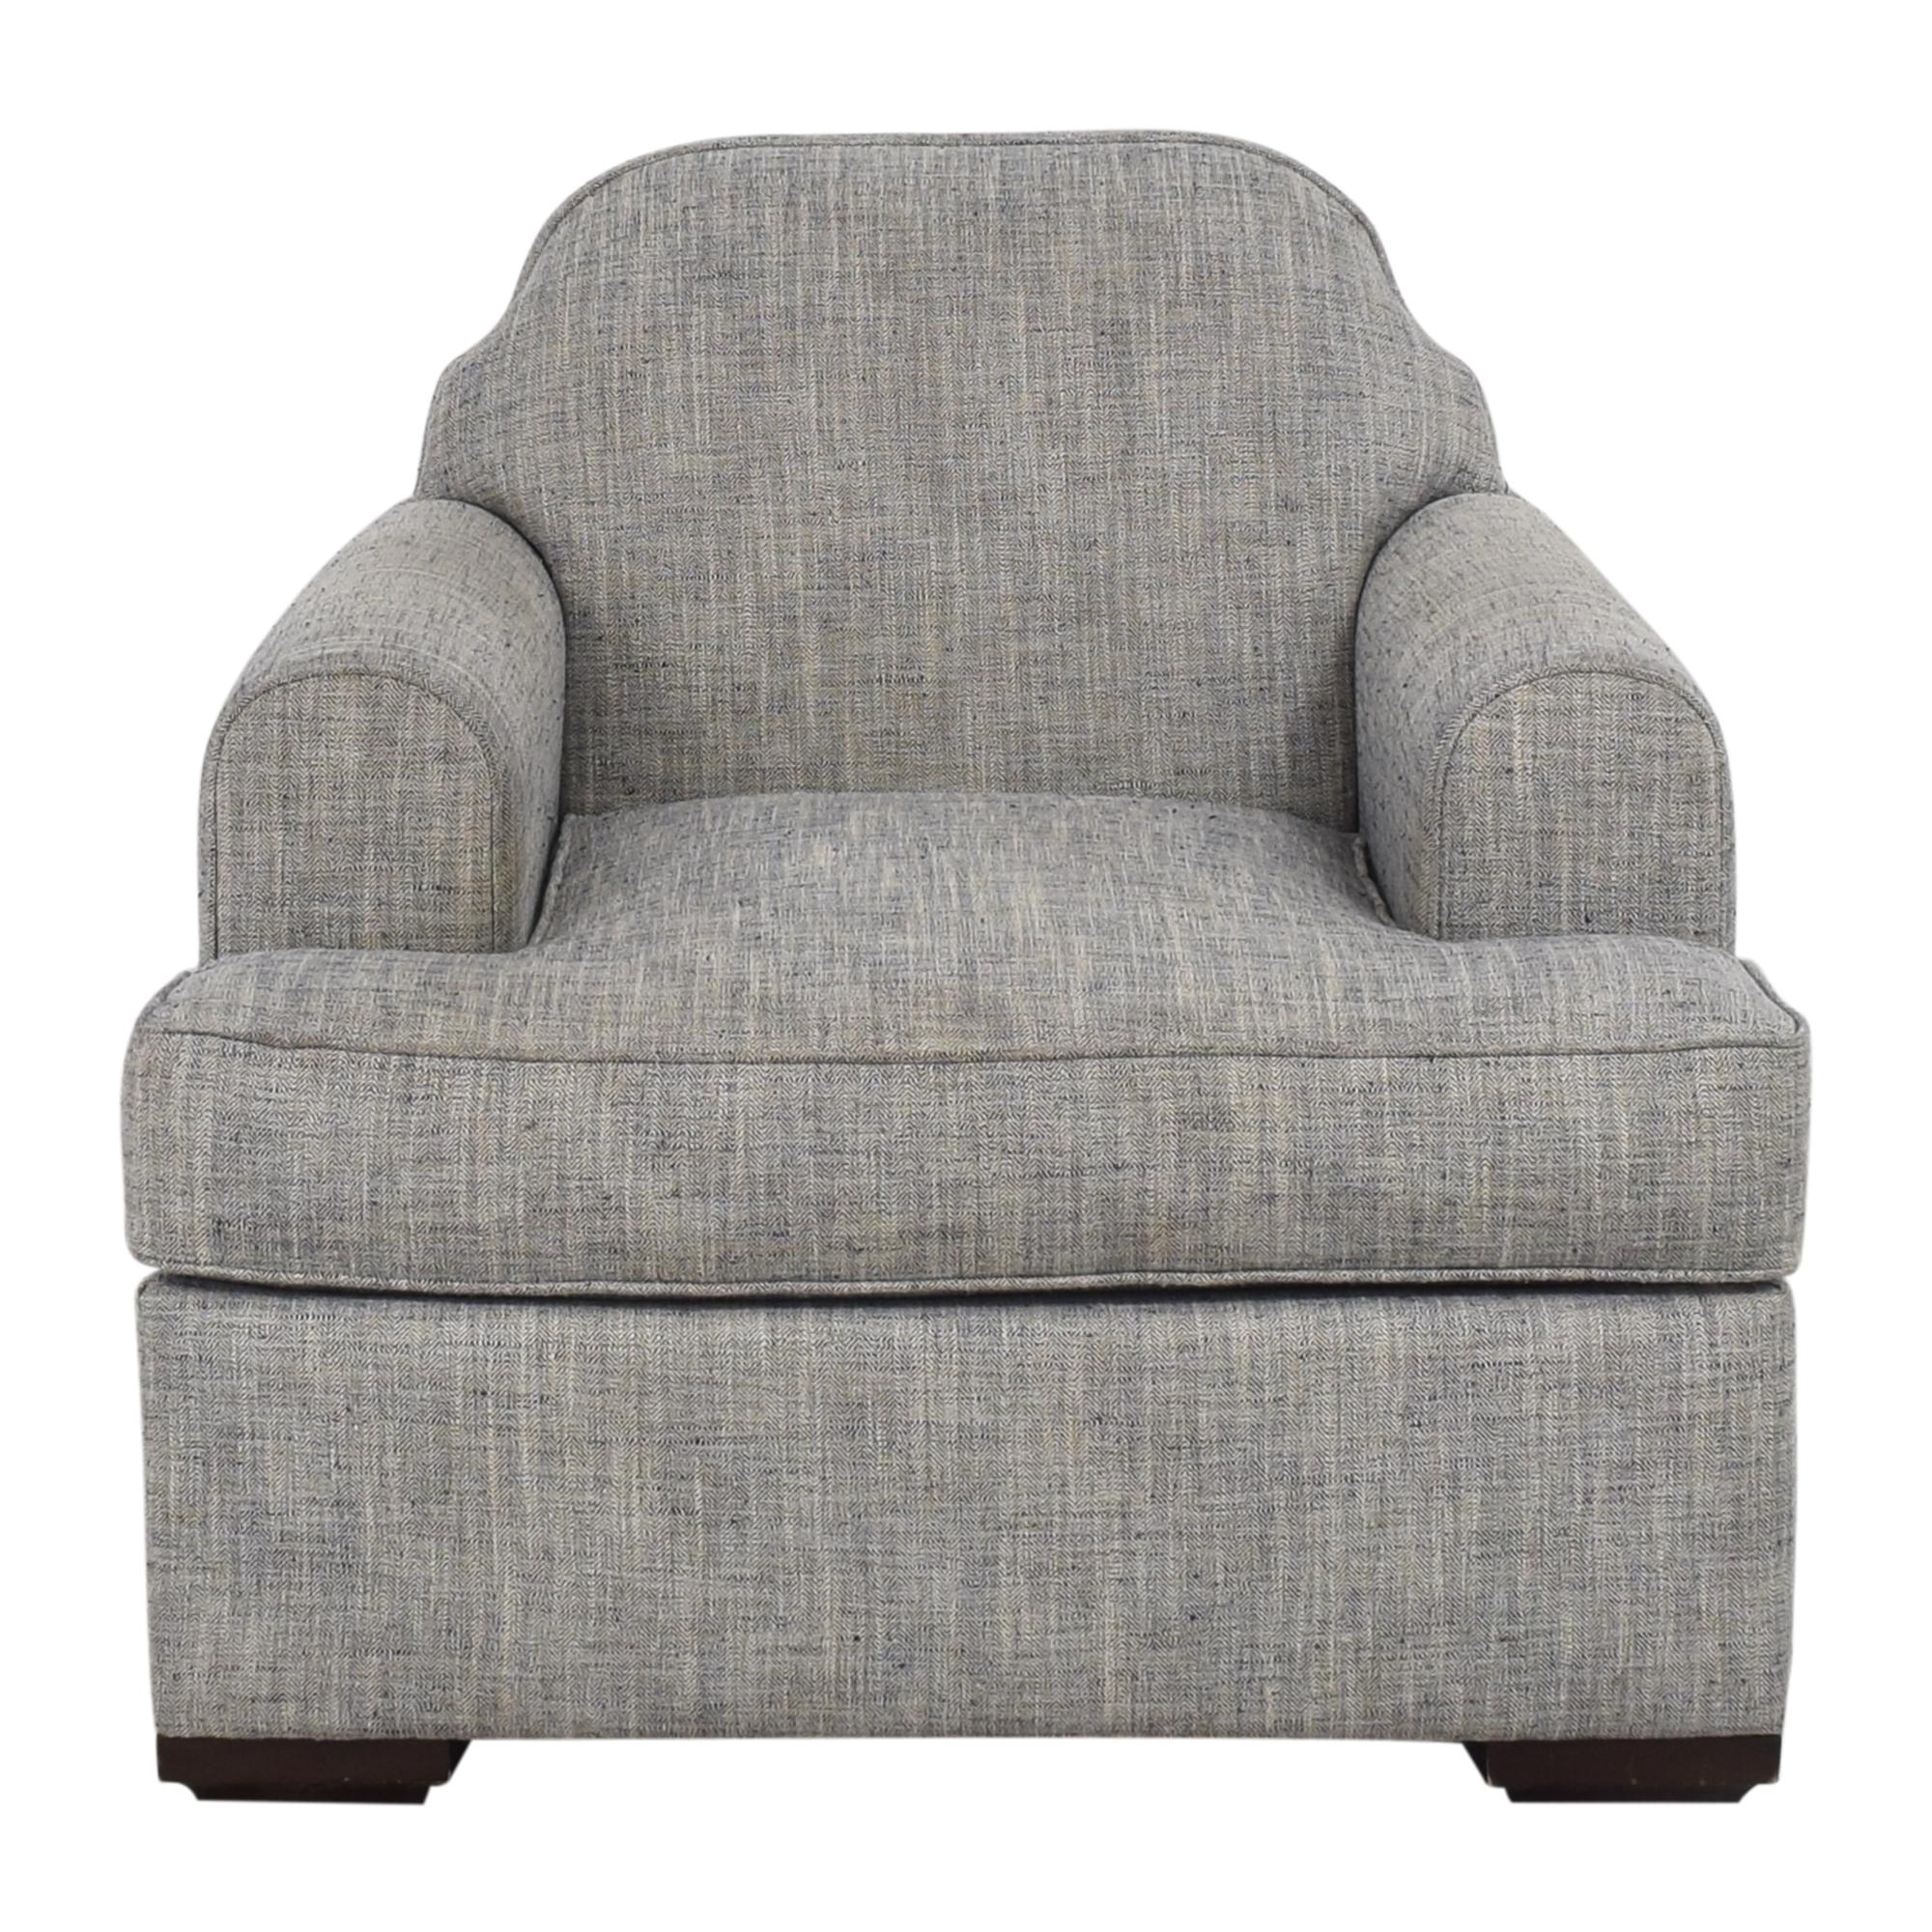 Century Furniture Century Furniture by Thomas O'Brien Club Chair